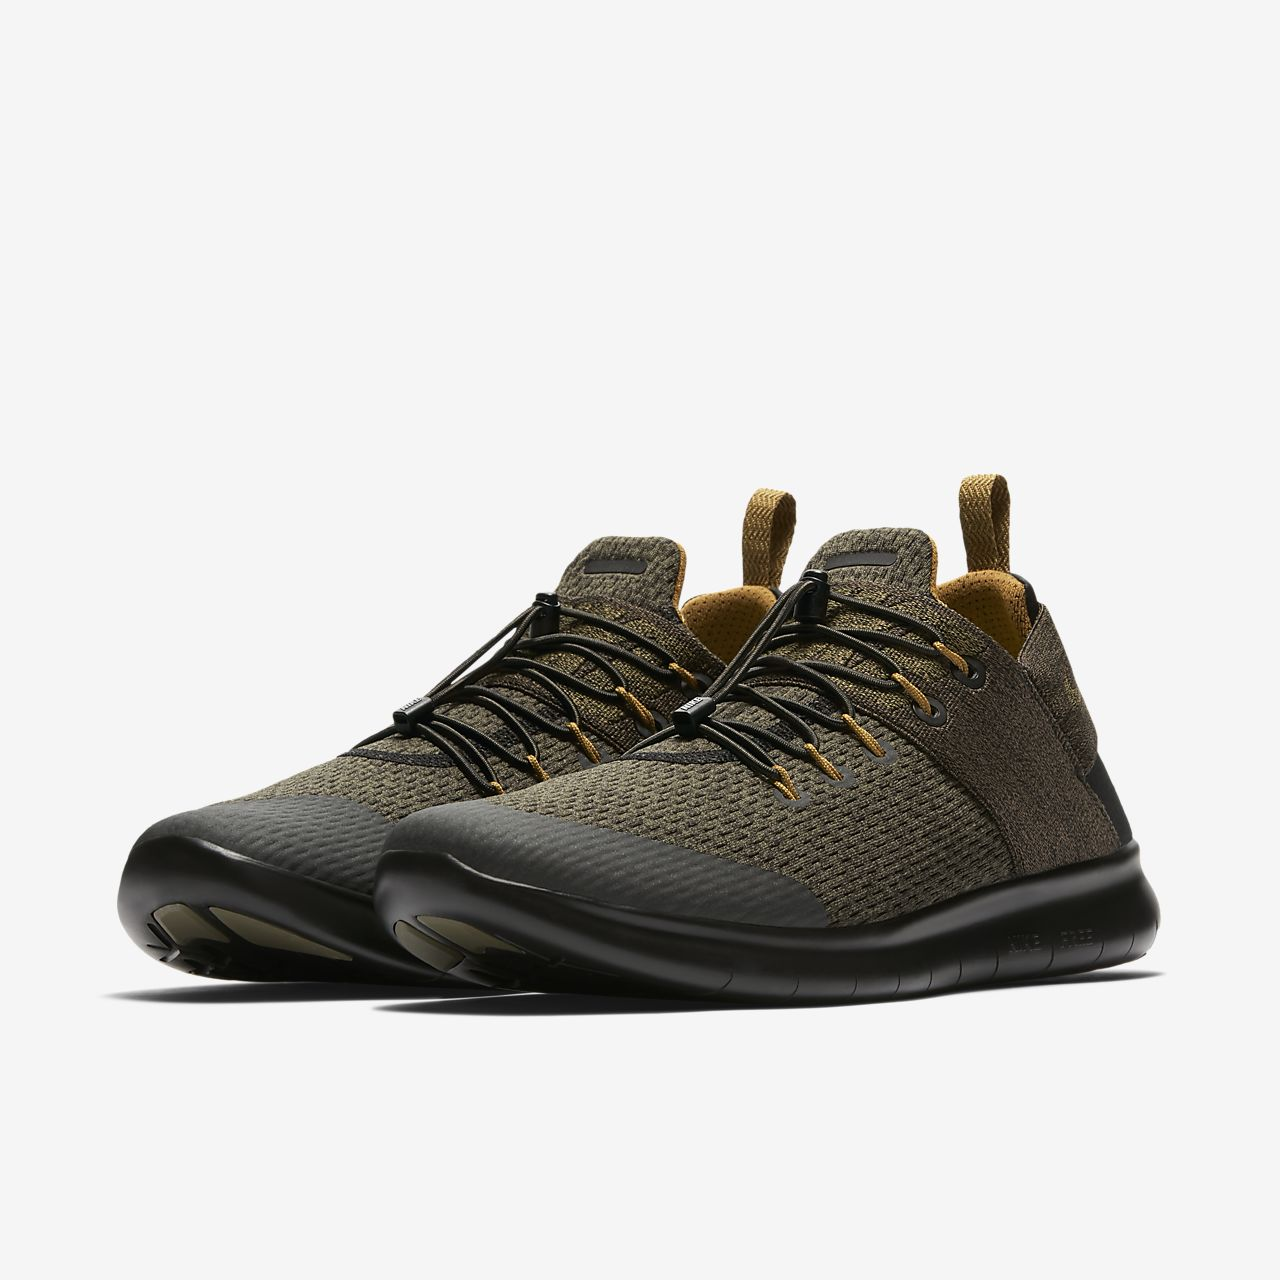 Nike Libre Rn Banlieusard 2017 Hommes Premium Chaussure De Course wiki jeu 2018 u5JVK7VS9